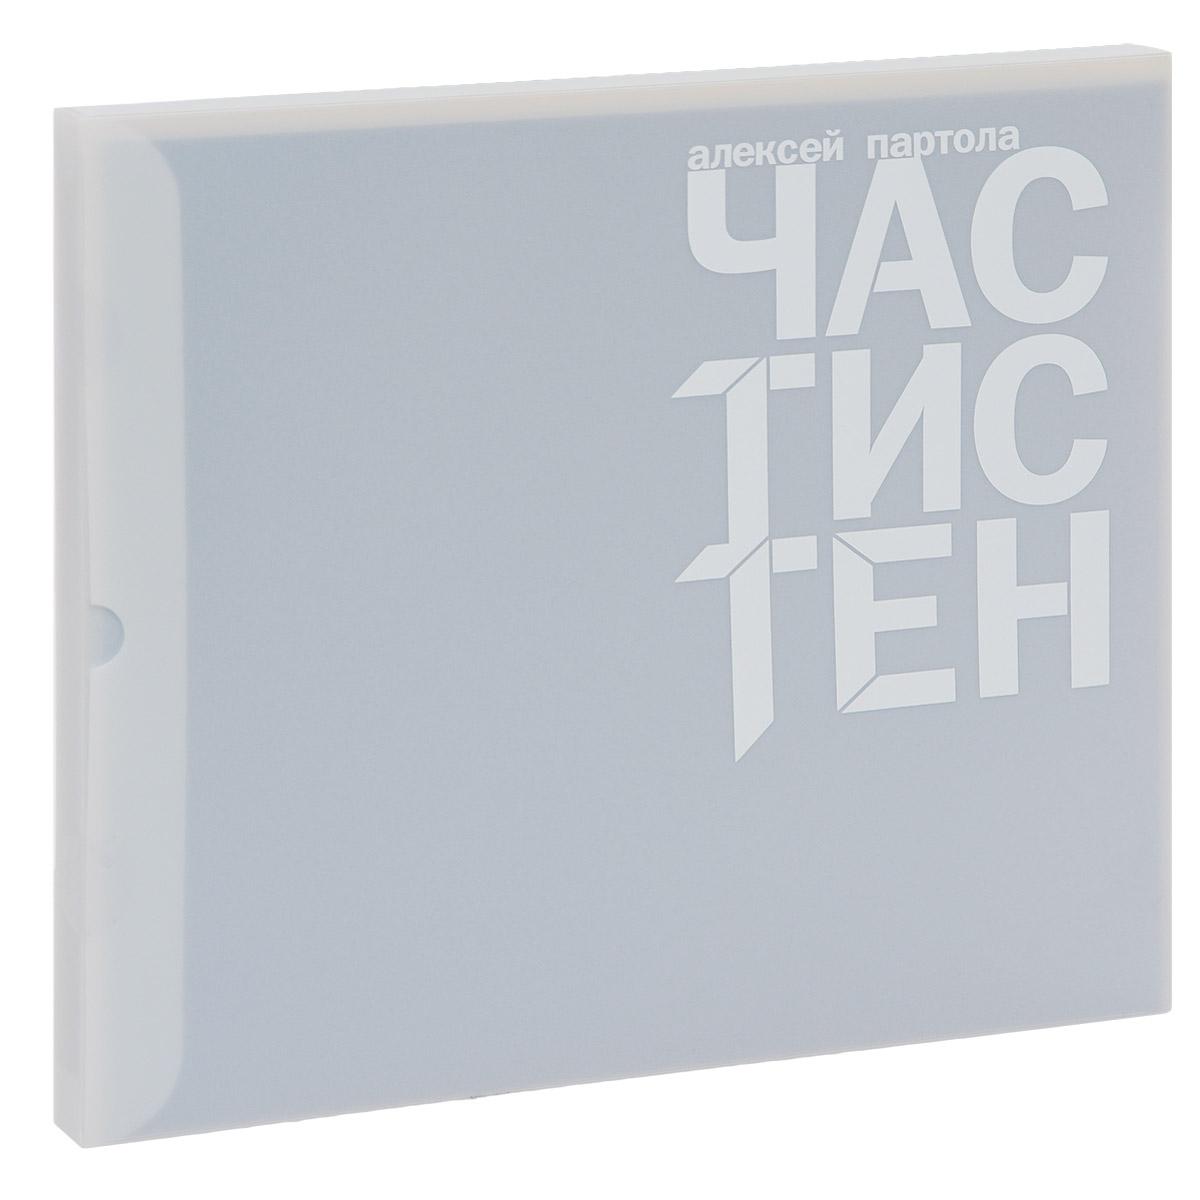 Zakazat.ru: Части стен. Художественный альбом / Wall Elements: Album